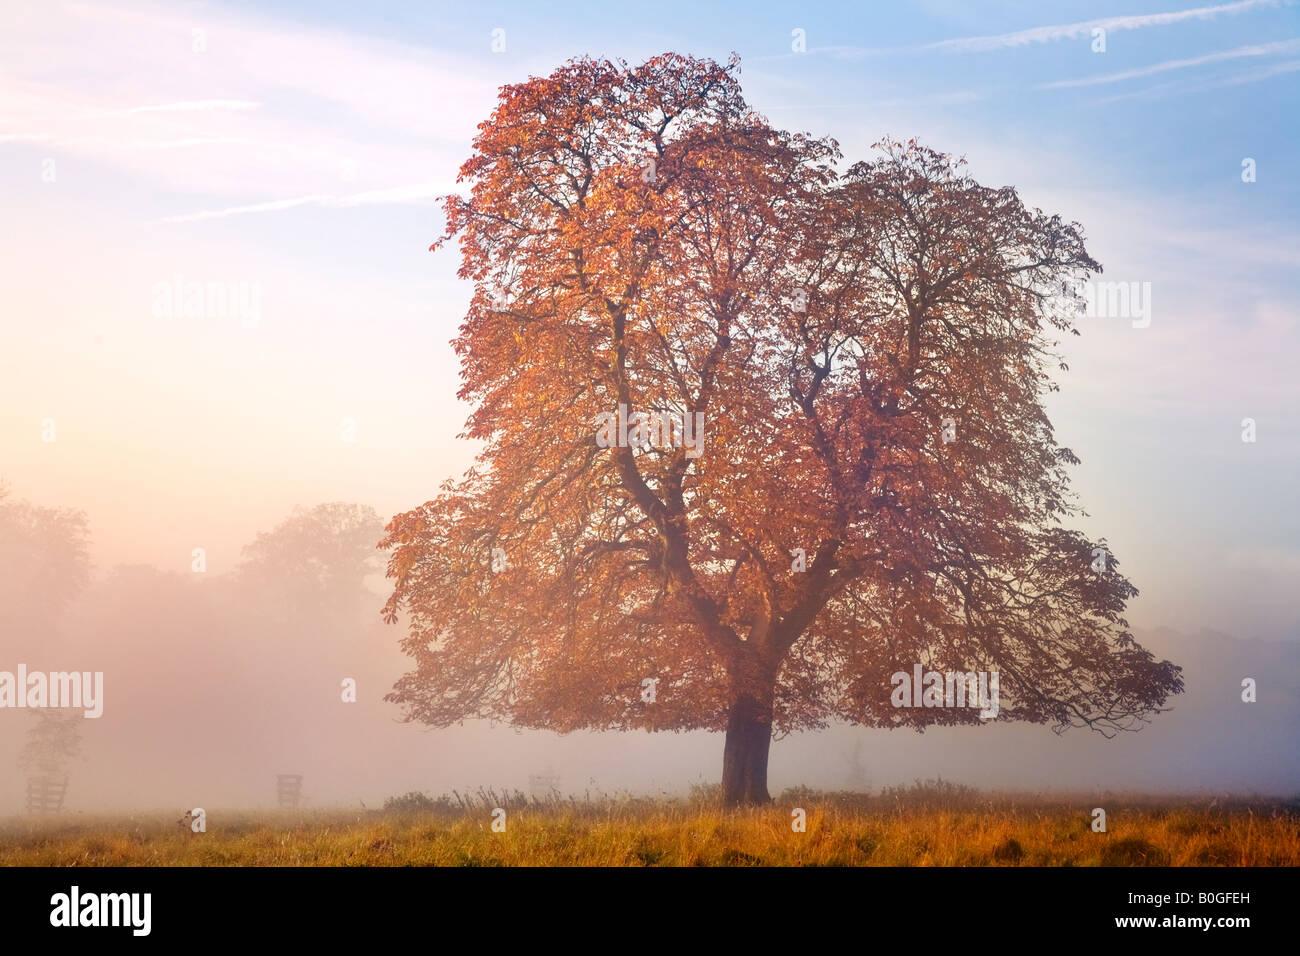 Autumn tree and mist - Chilterns, Buckinghamshire - Stock Image